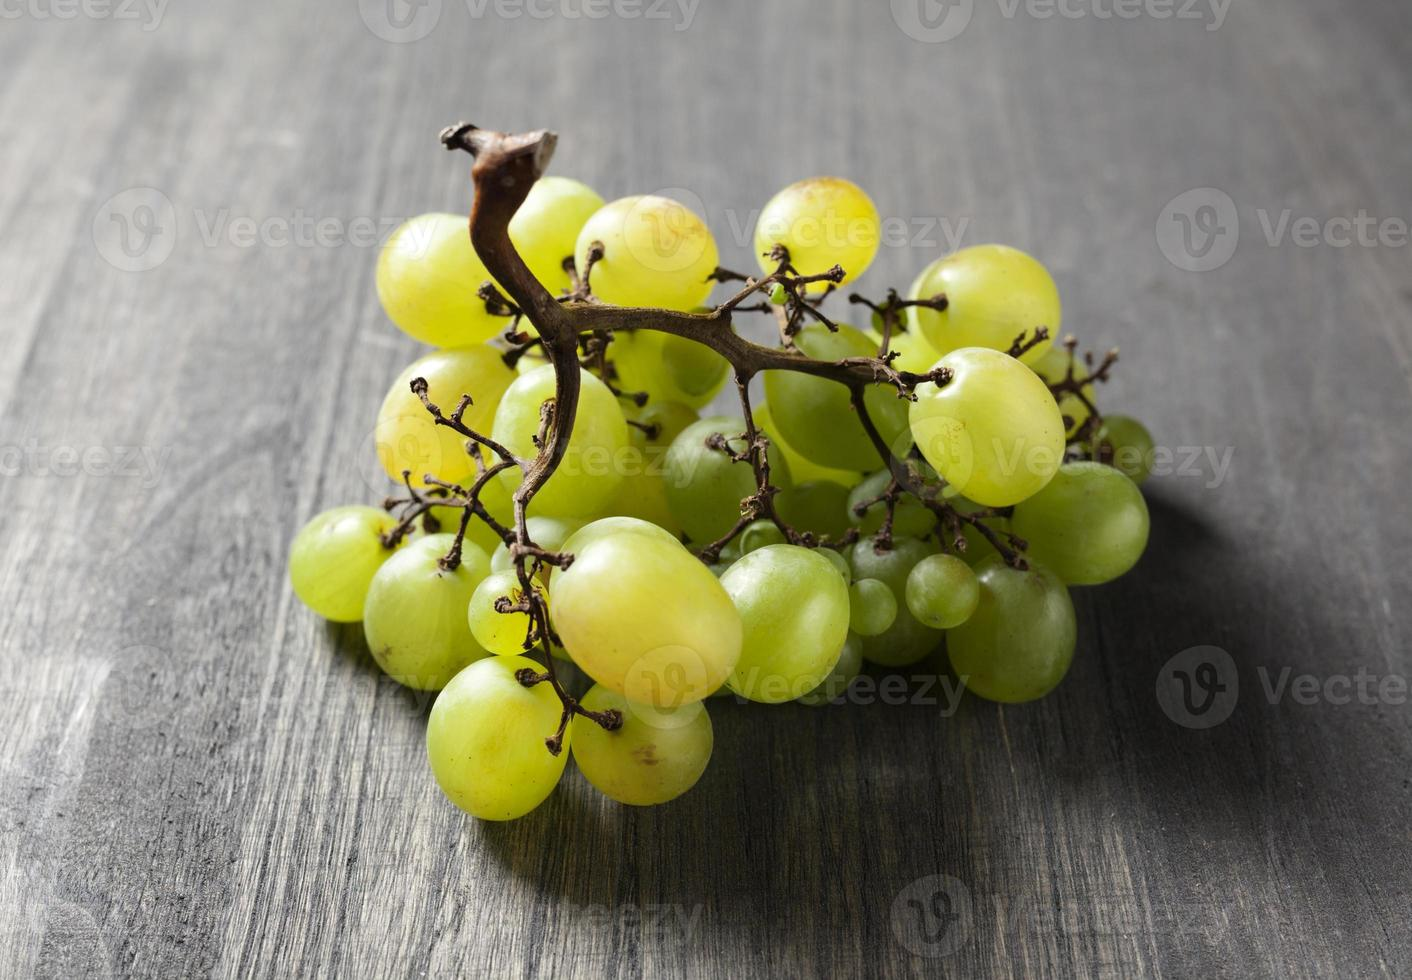 groene druif op een houten tafel foto